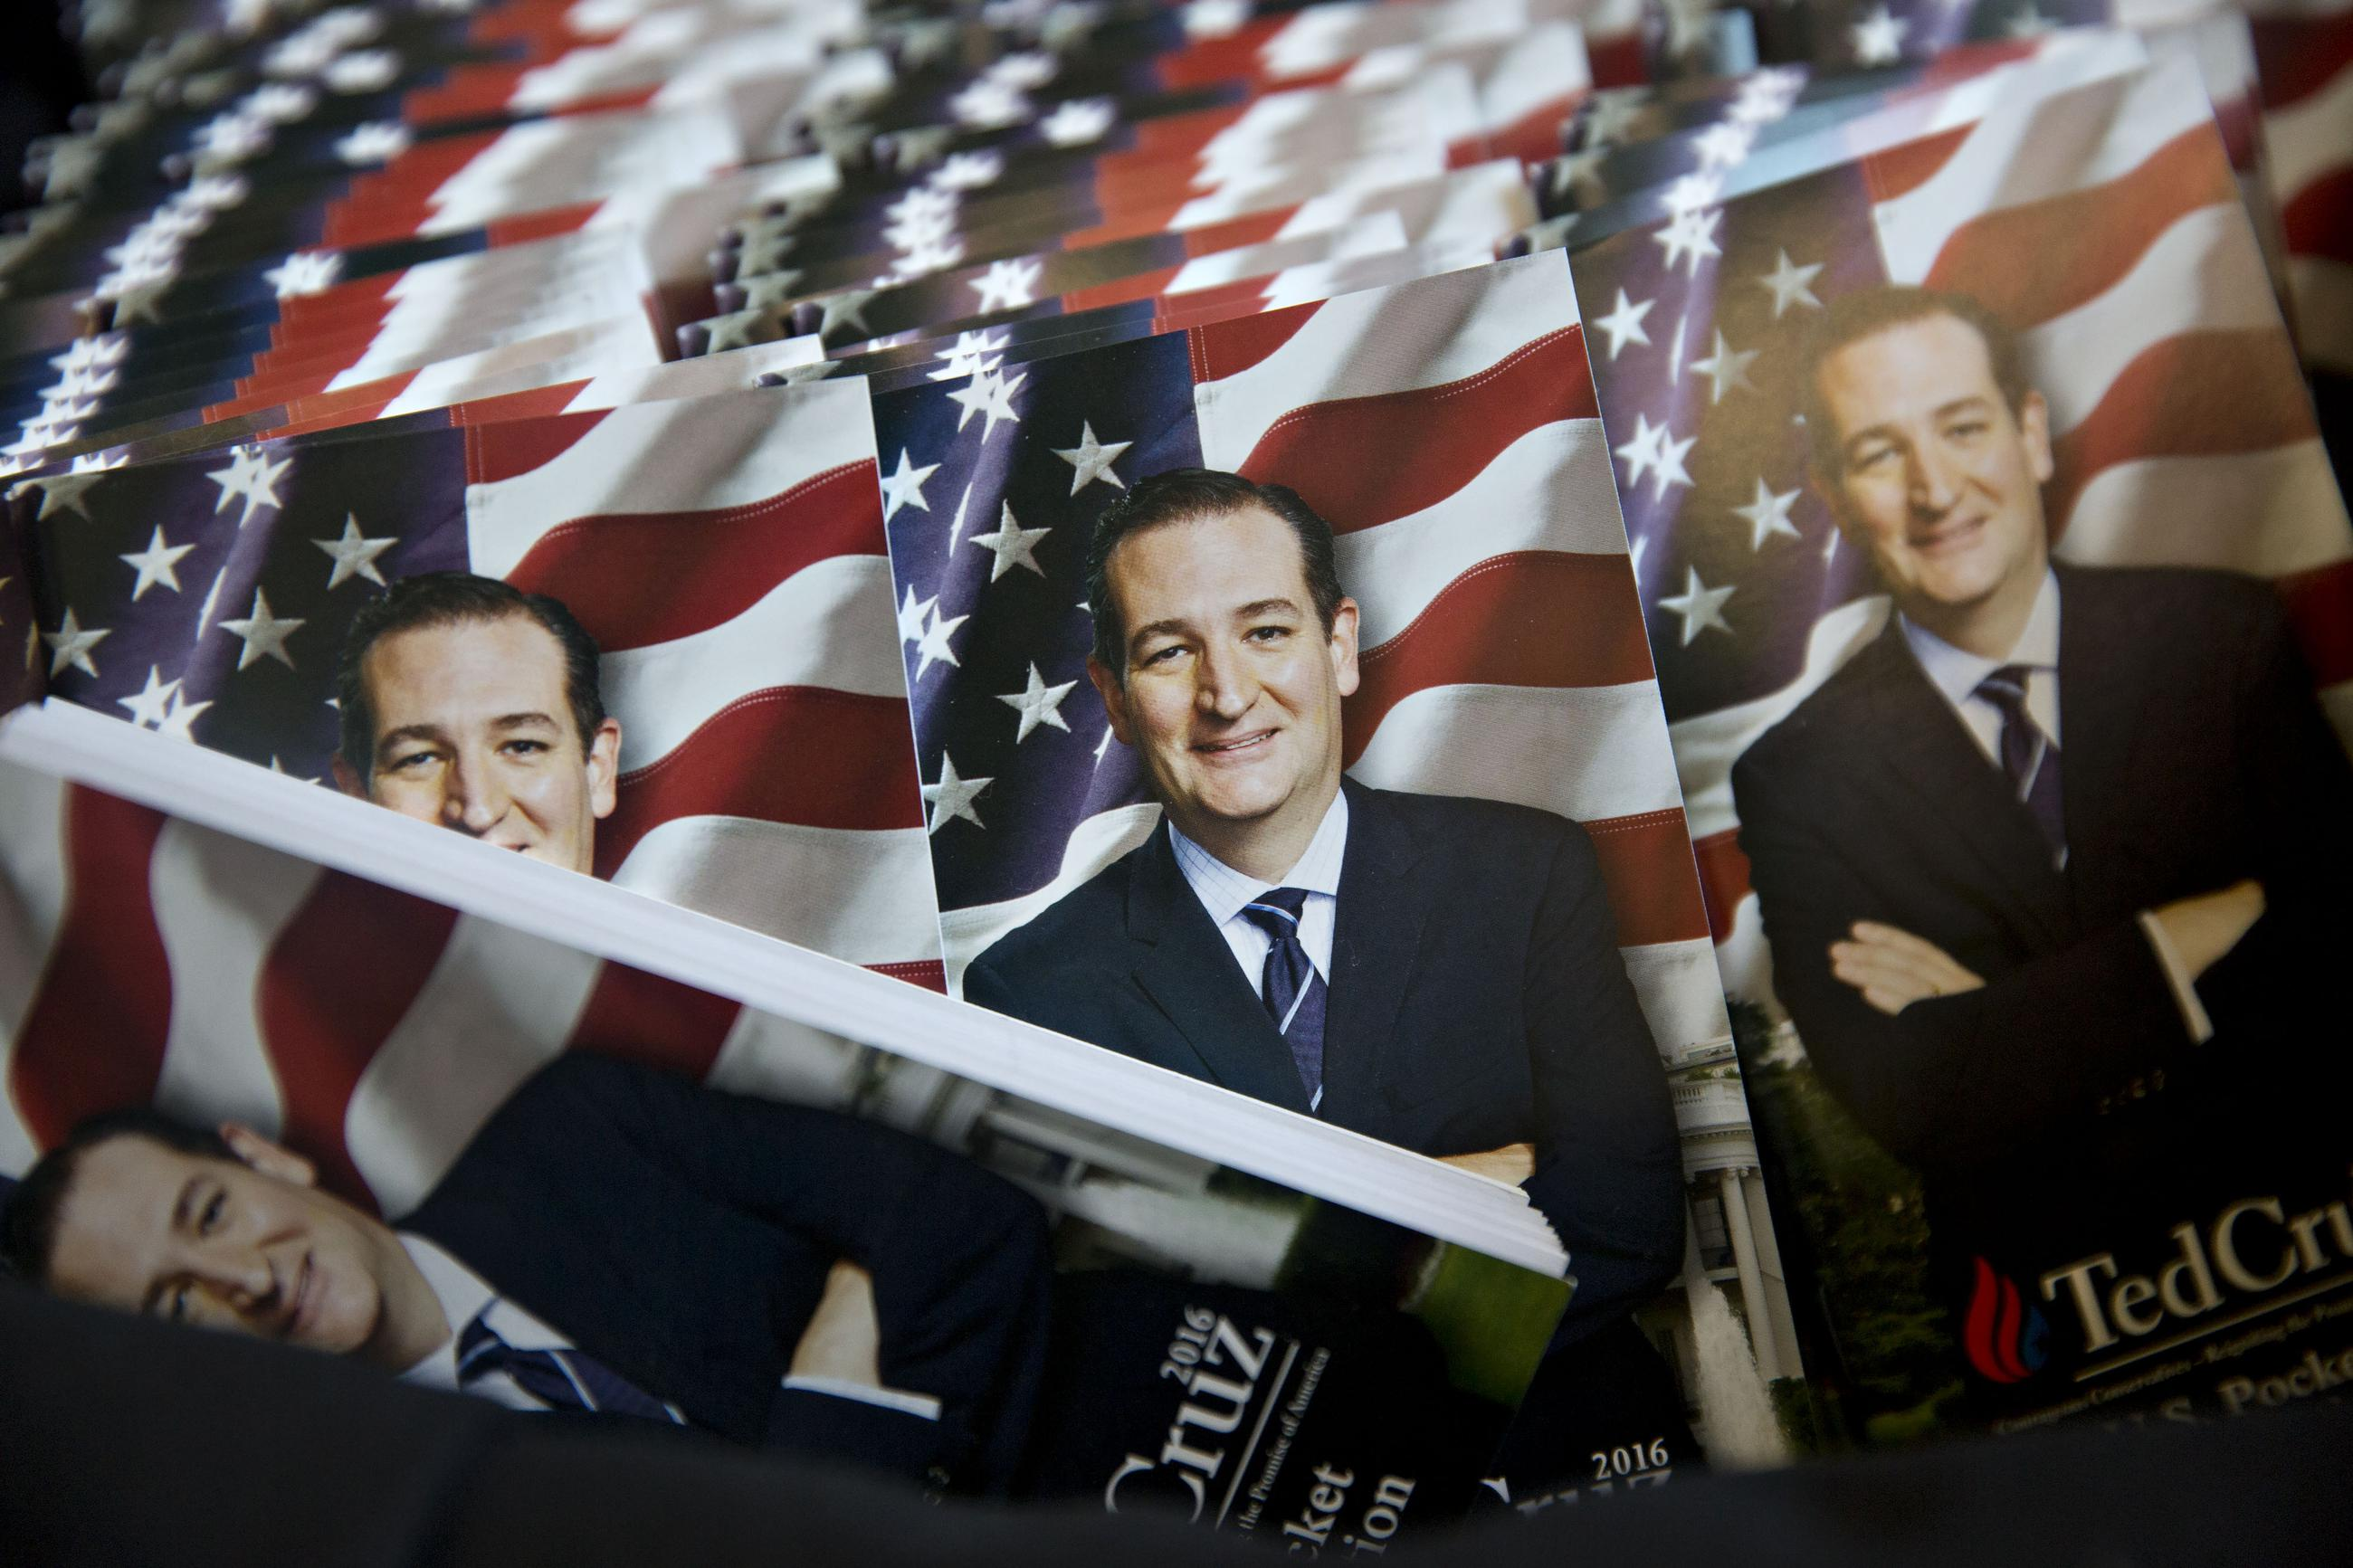 Ted Cruz Is Stalking Donald Trump